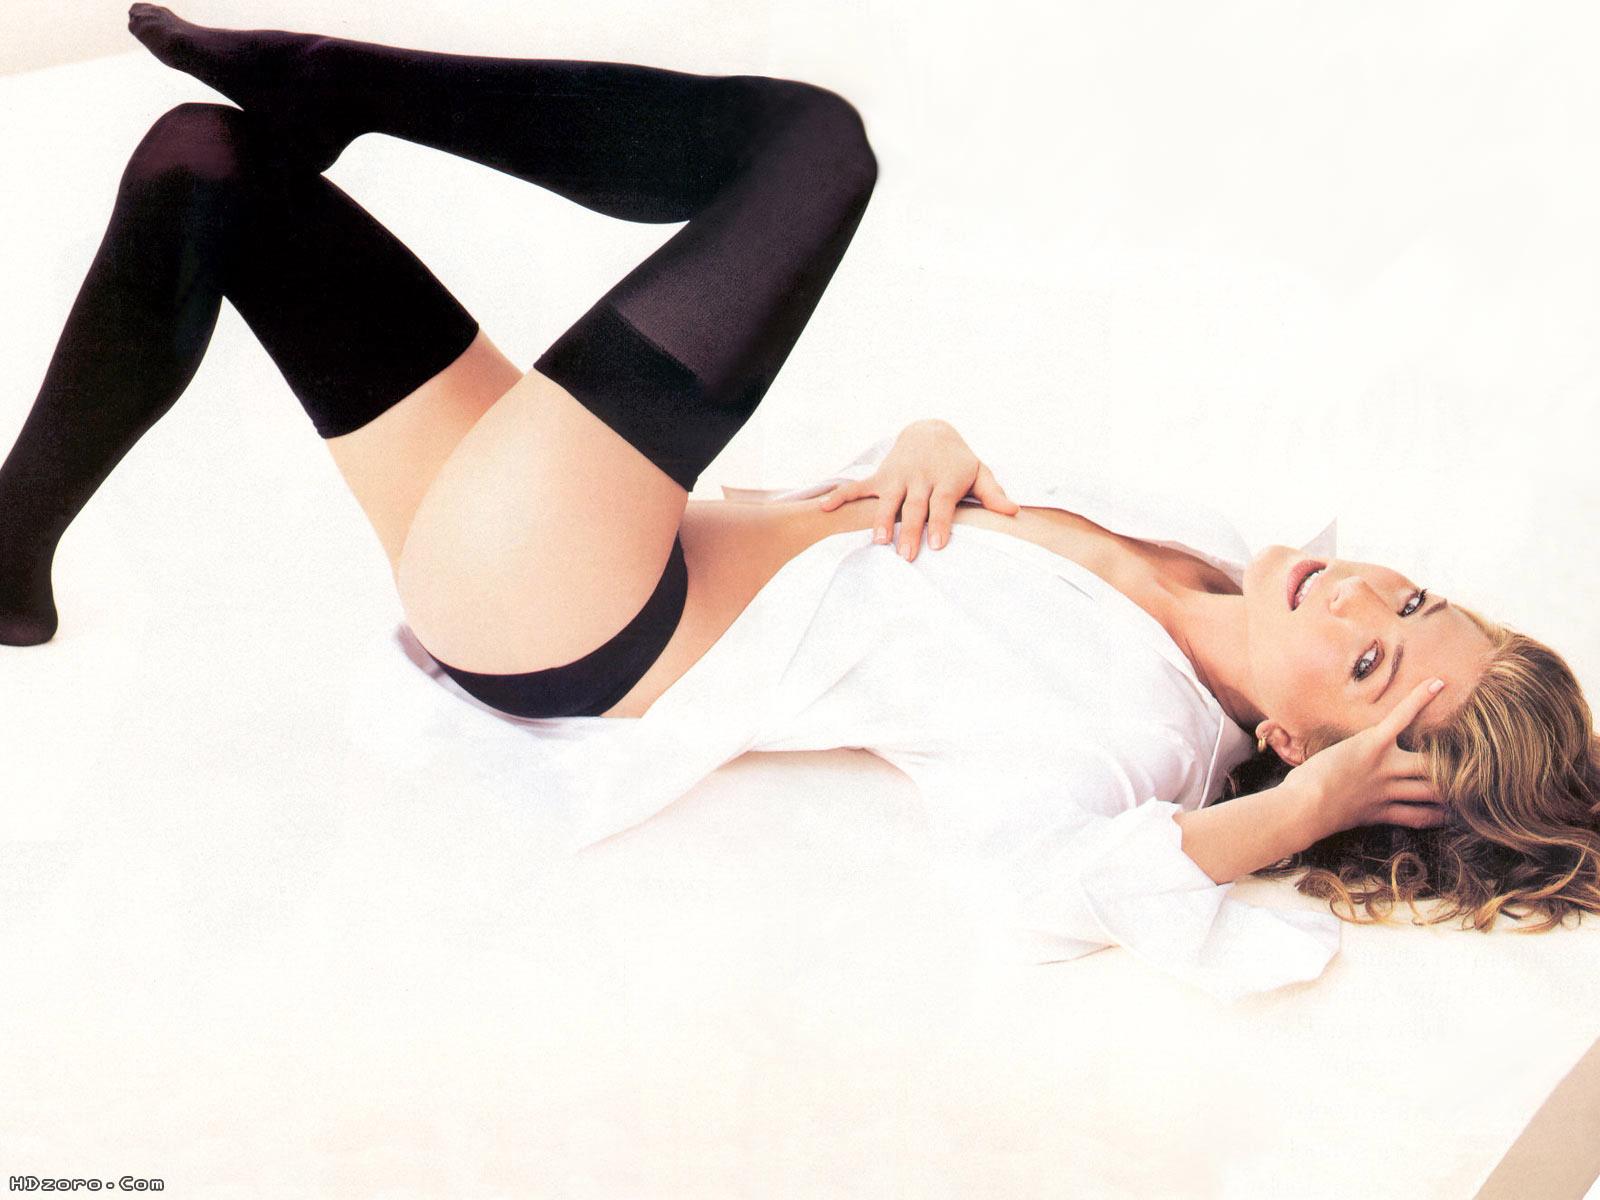 http://4.bp.blogspot.com/-UiWaGufRTiE/UUlaD8tUm9I/AAAAAAAARGg/Ij7XhW_REW0/s1600/Jennifer+Aniston+12.jpg